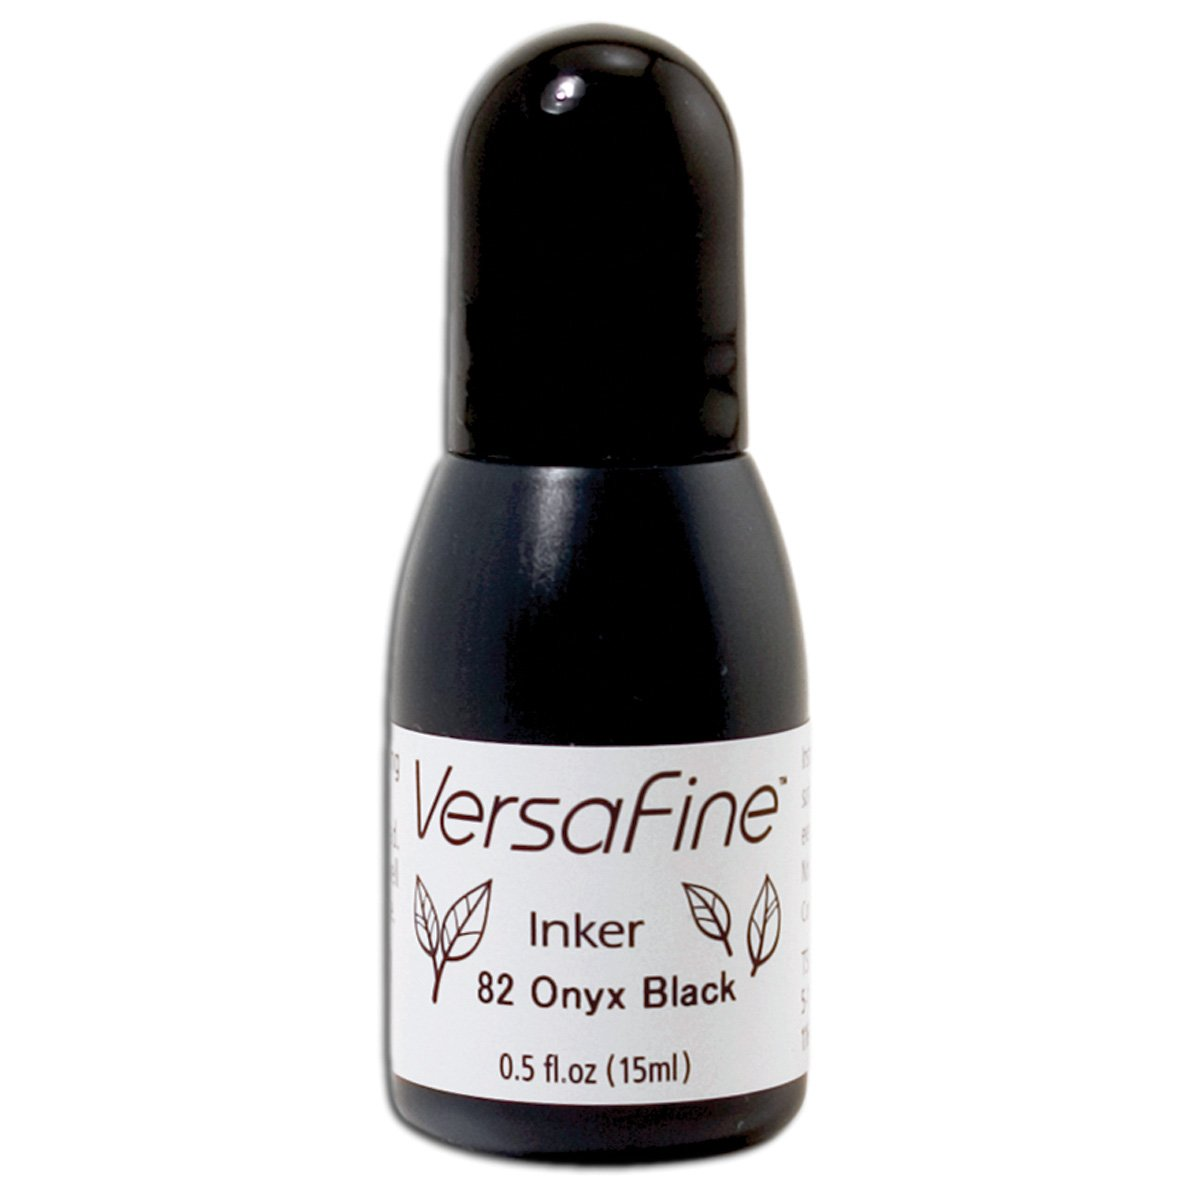 Imagine Crafts Ink VersaFine Pigment Inker-Onyx Black RF000082